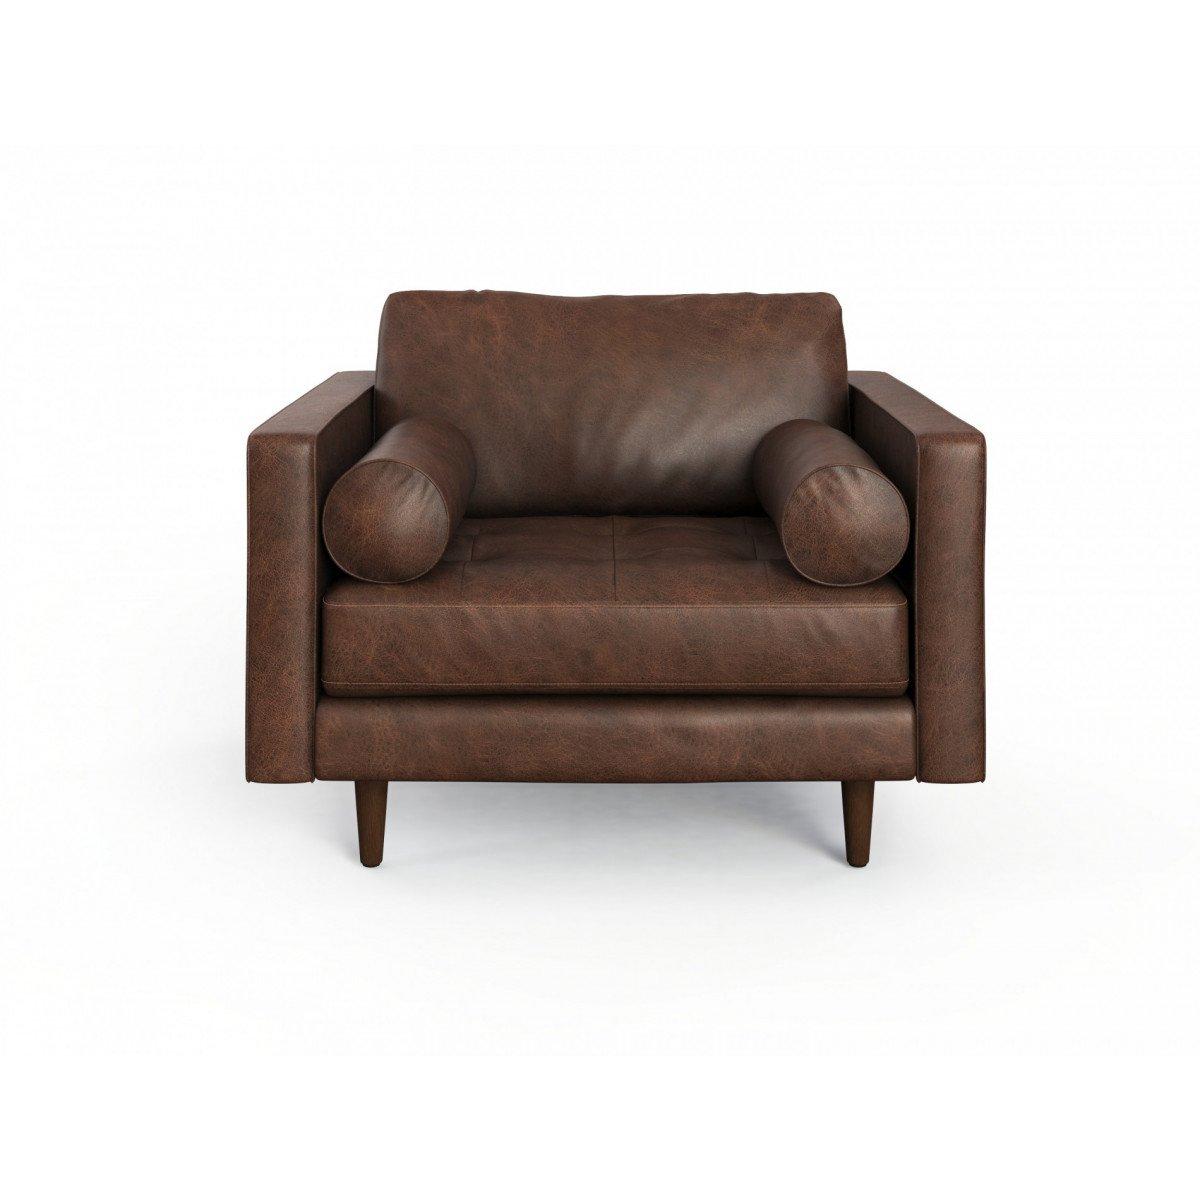 Mẫu ghế bành 6